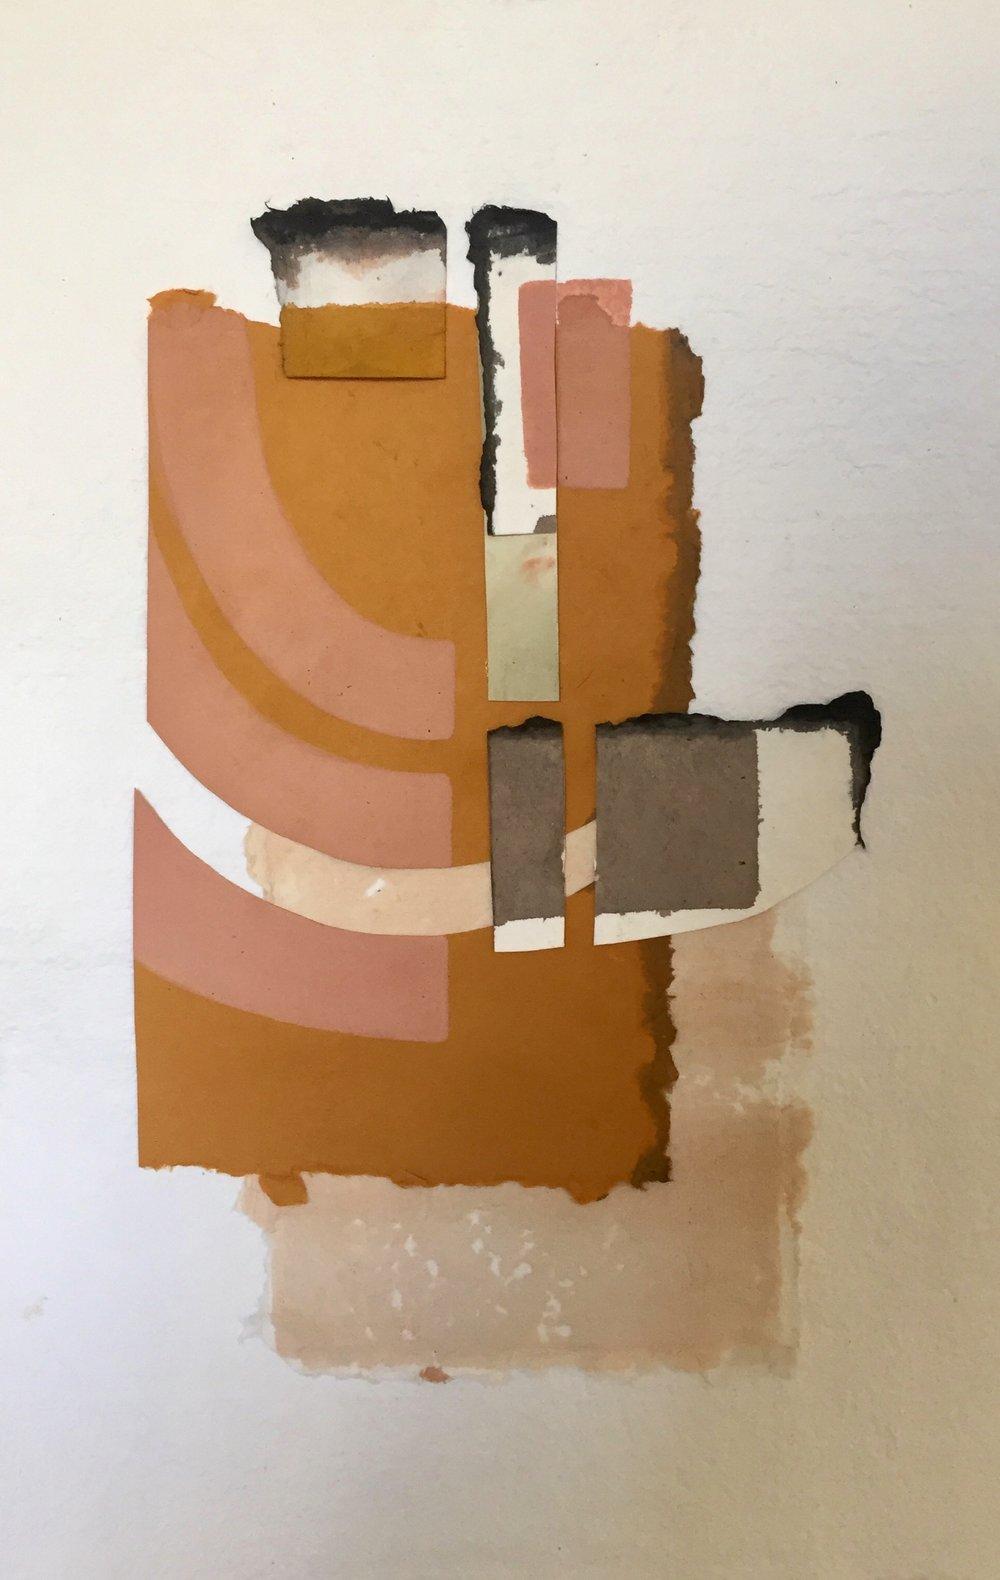 18 x 12   'Warm City' on deckled edge paper, custom framed   available